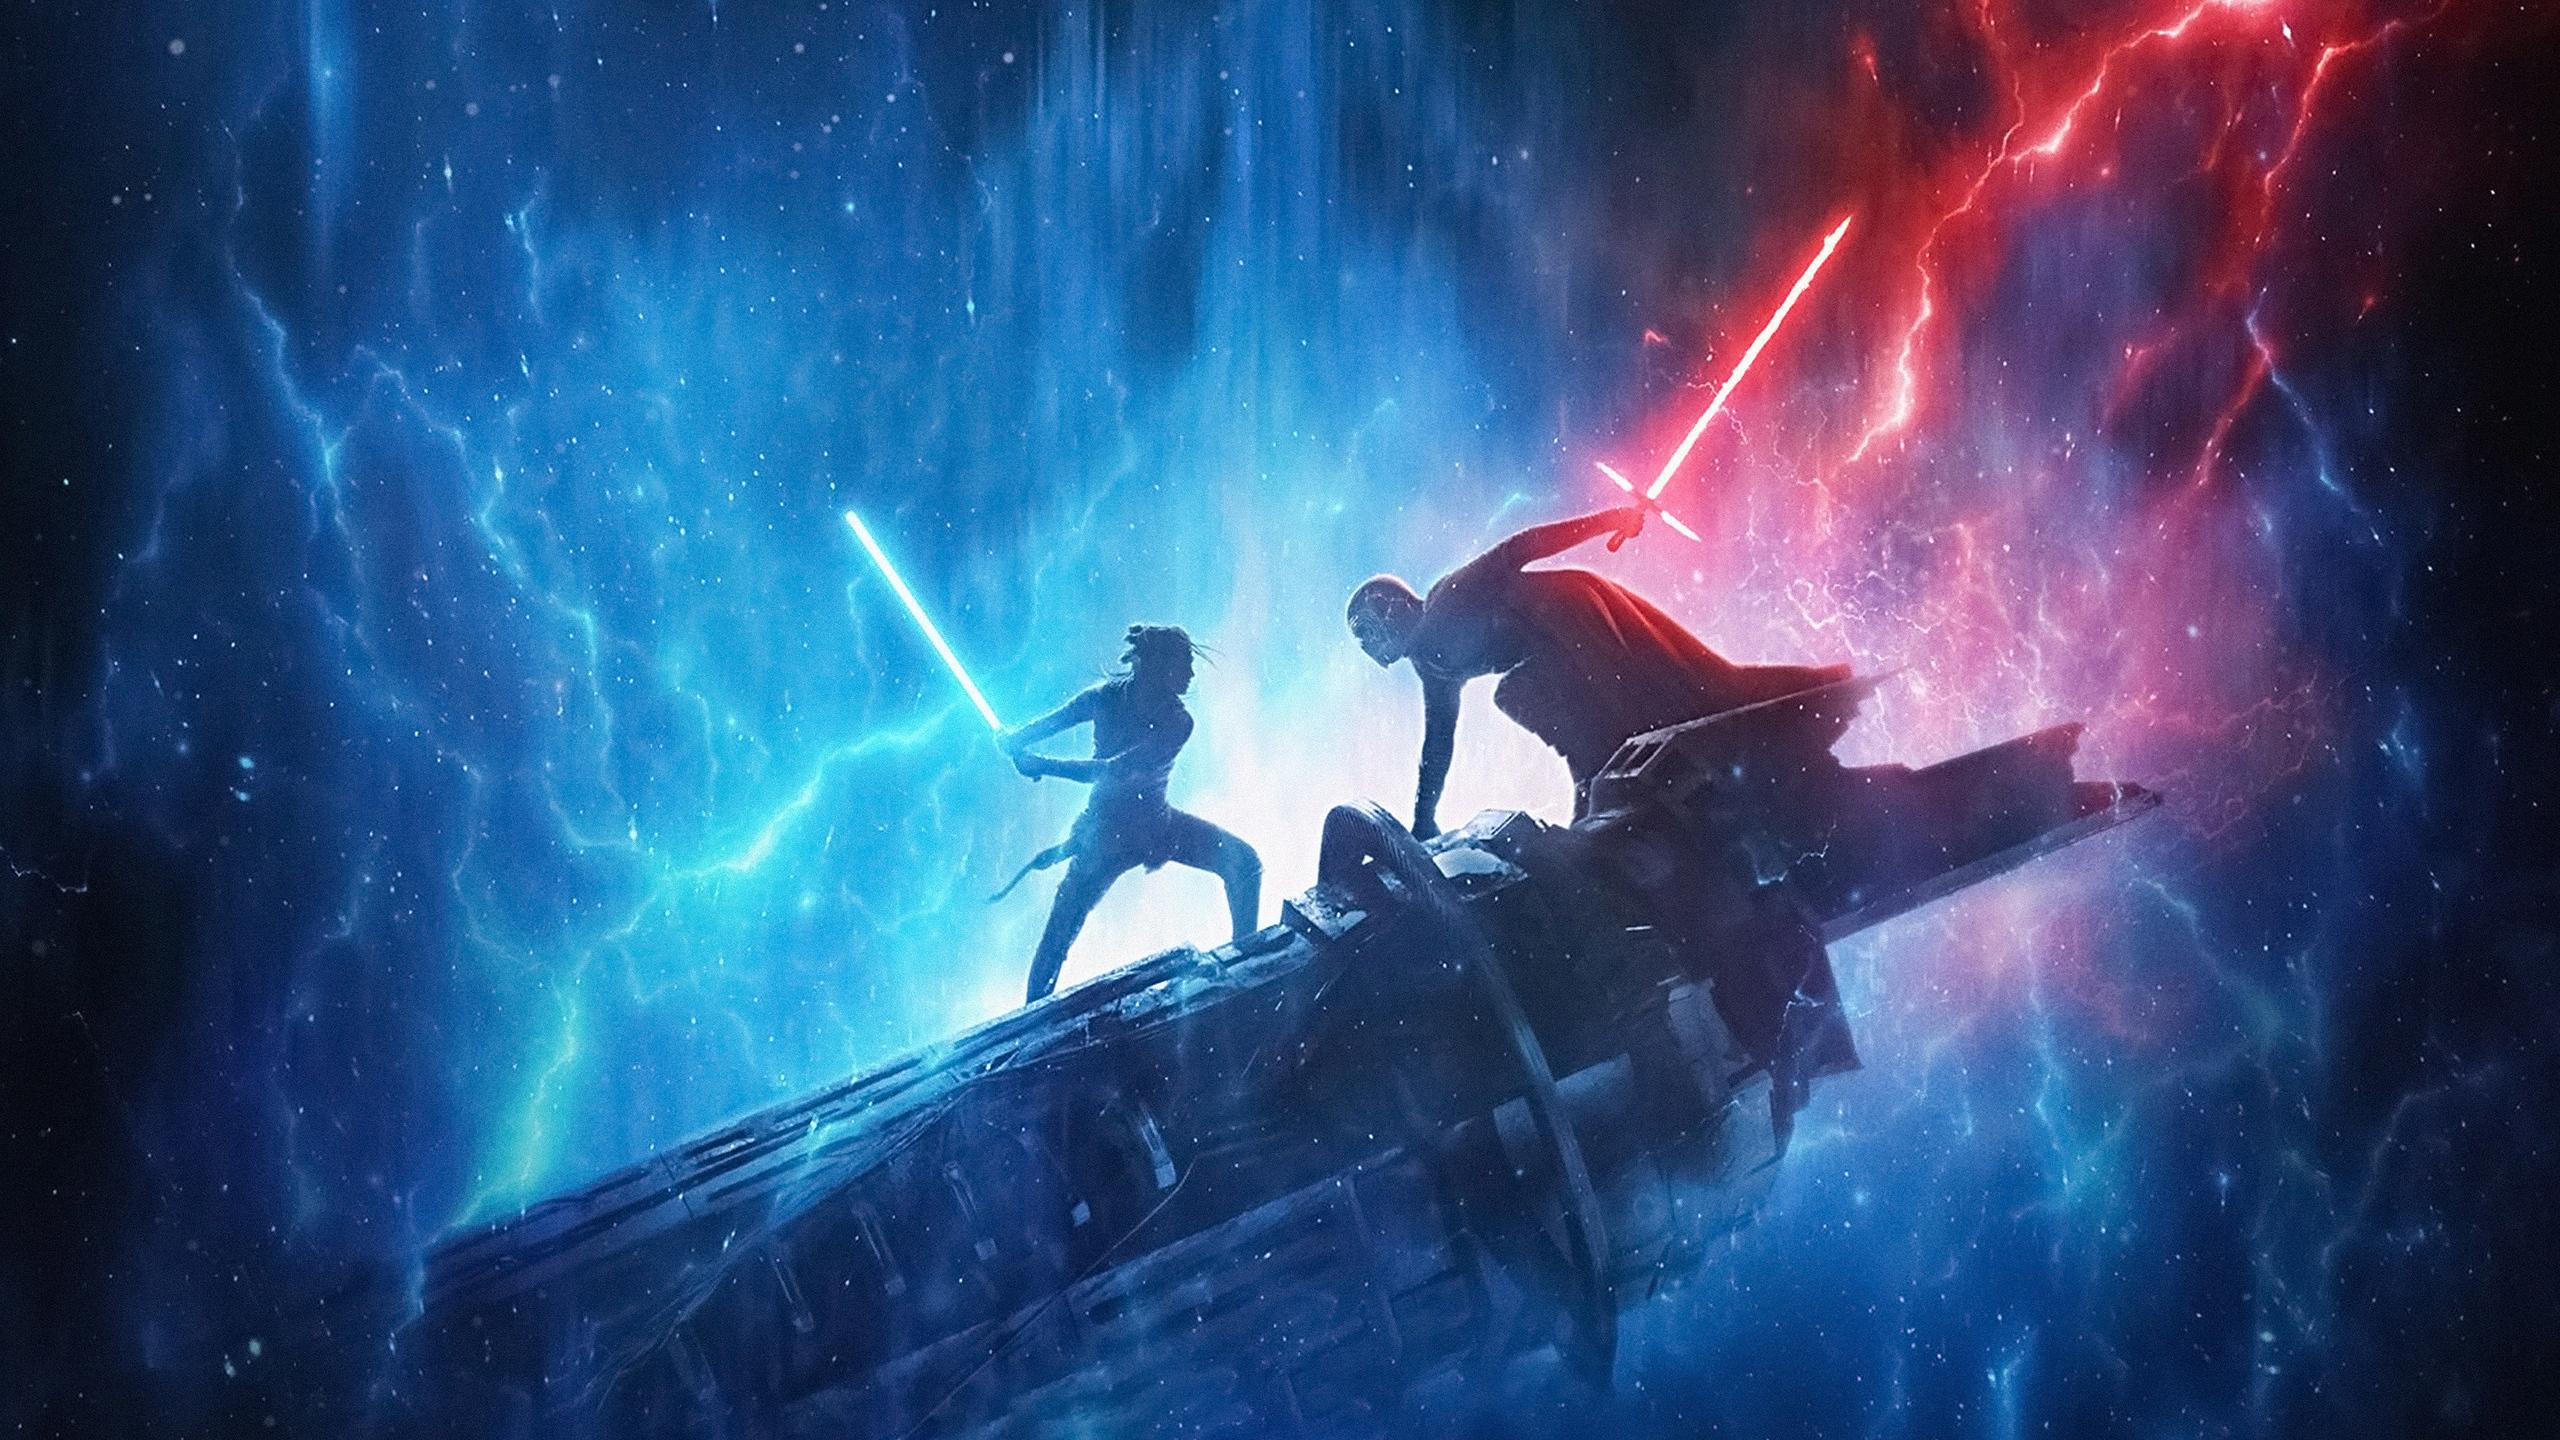 2560x1440 Star Wars The Rise Of Skywalker 2019 4k 1440p